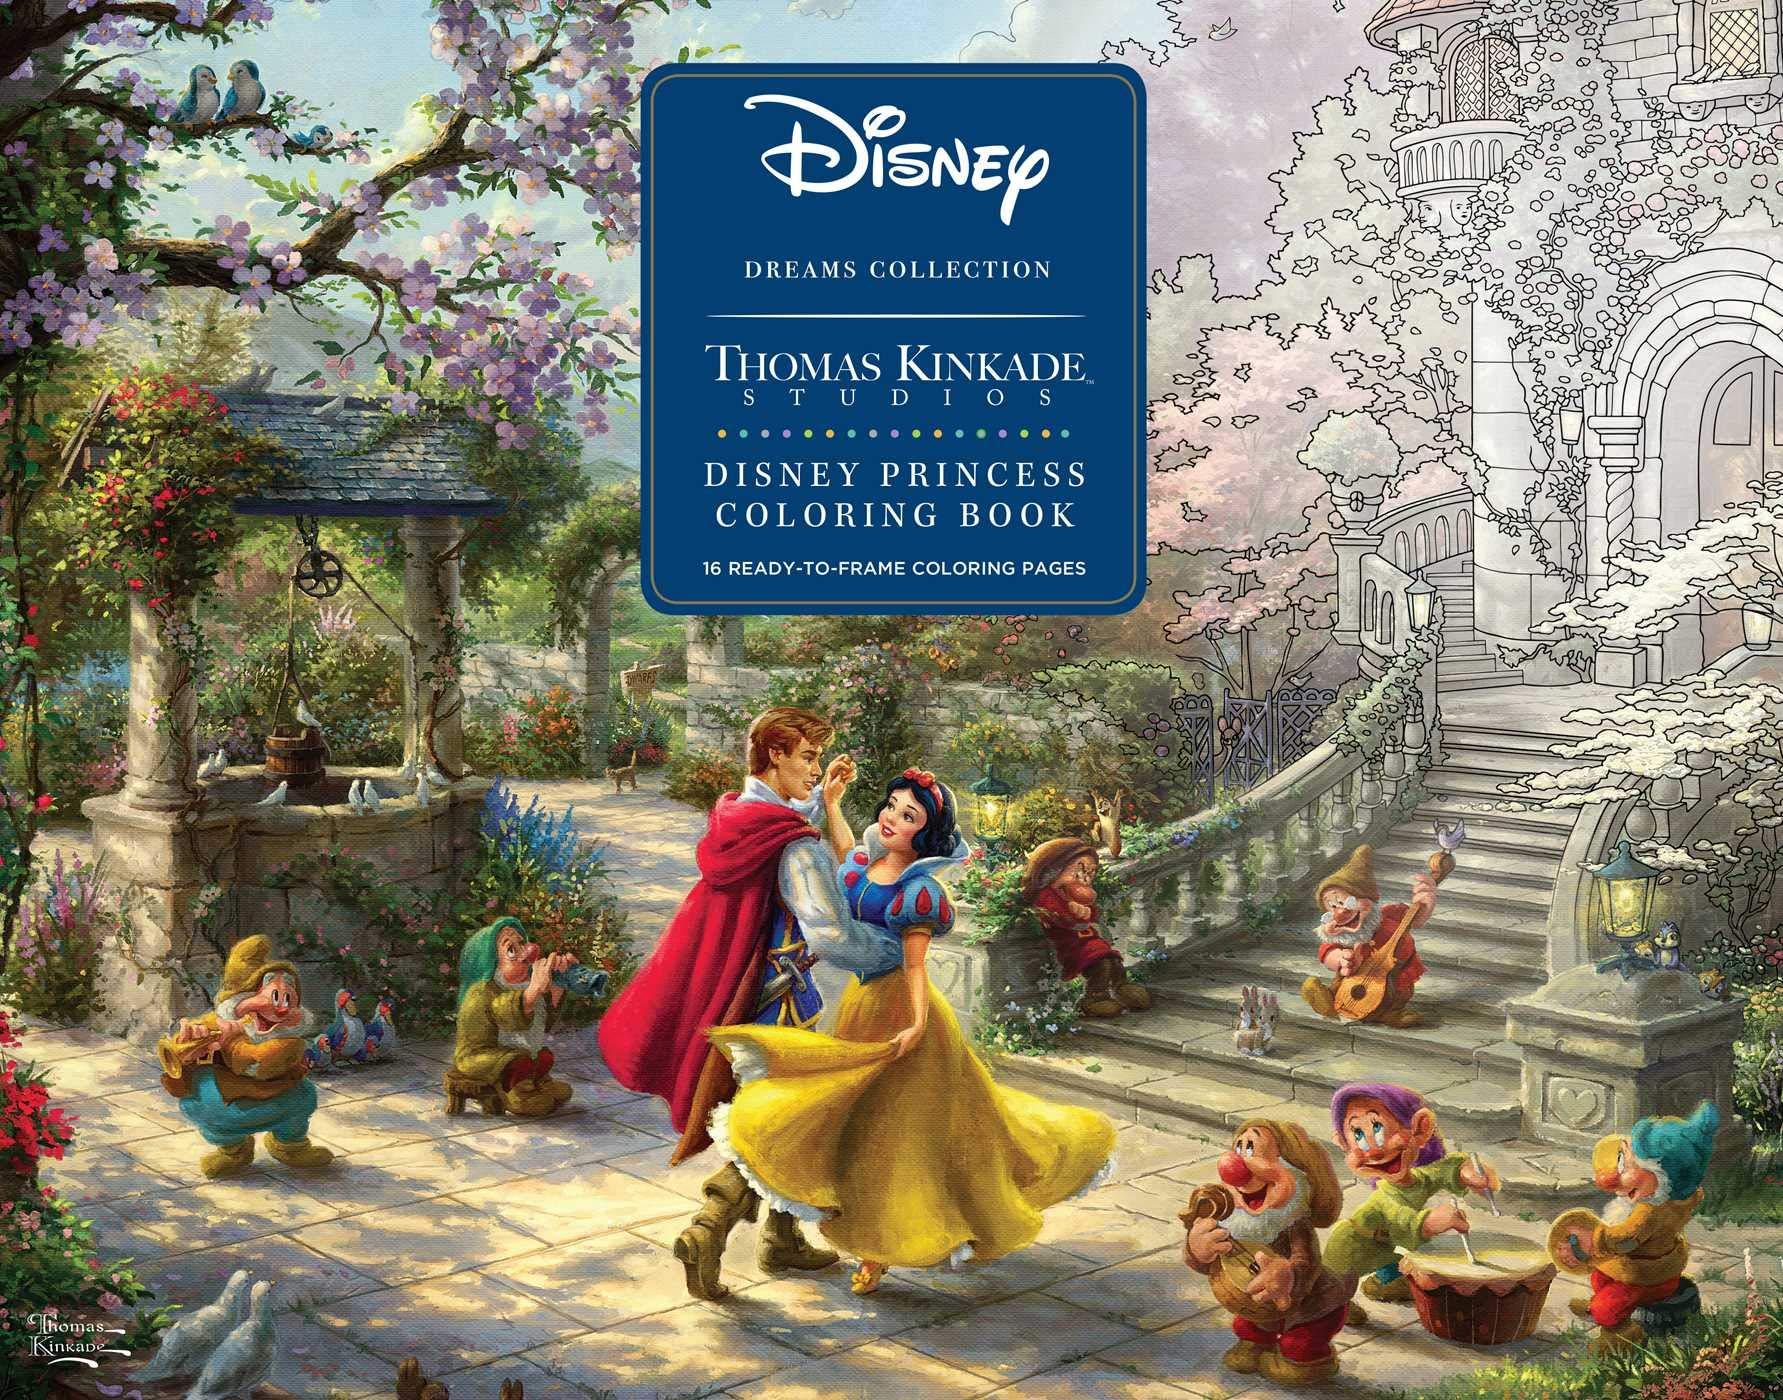 Amazon.com: Disney Dreams Collection Thomas Kinkade Studios Disney